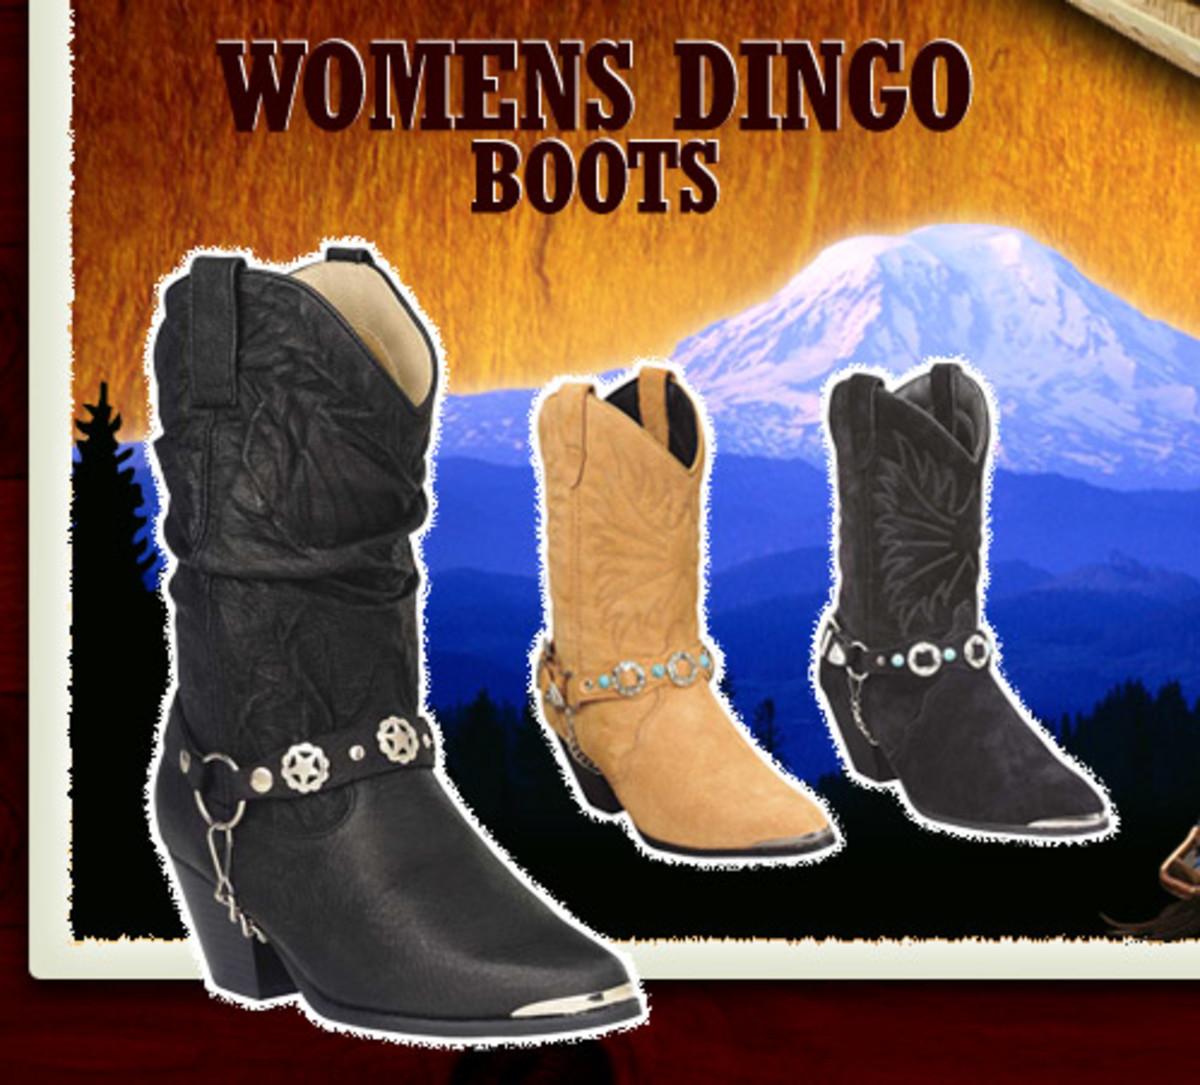 Women's Dingo Boots